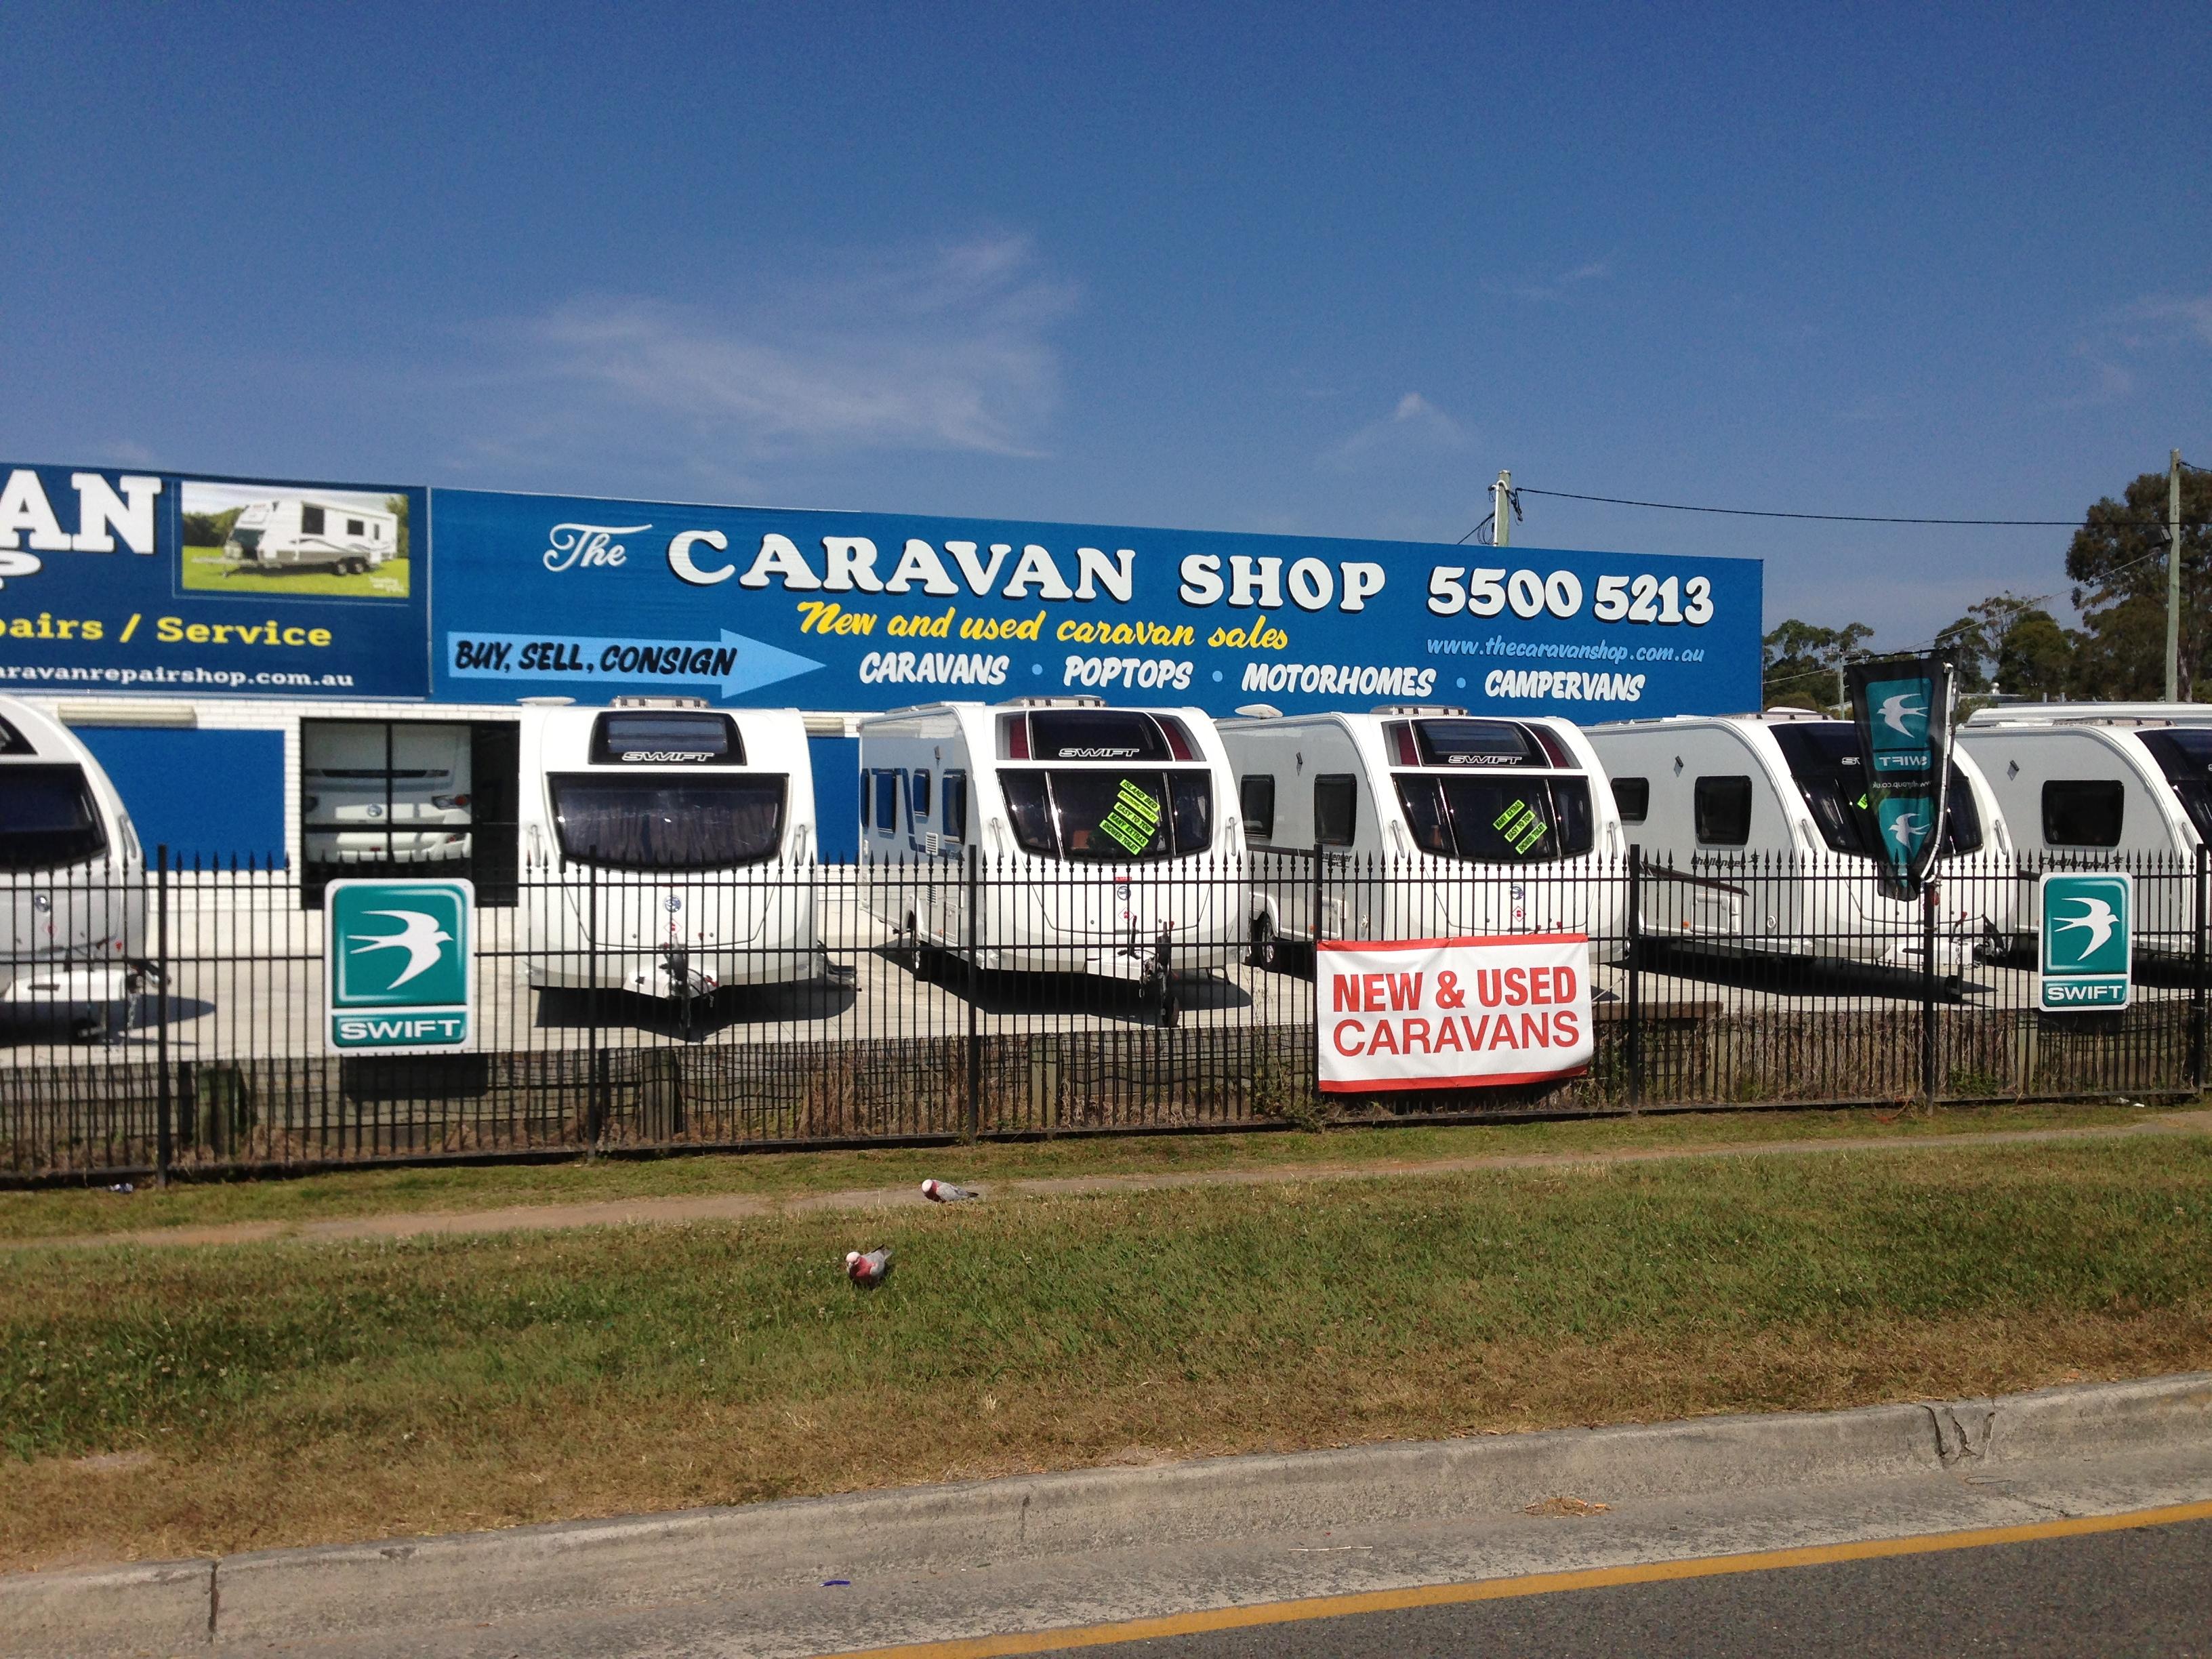 Caravan and RV